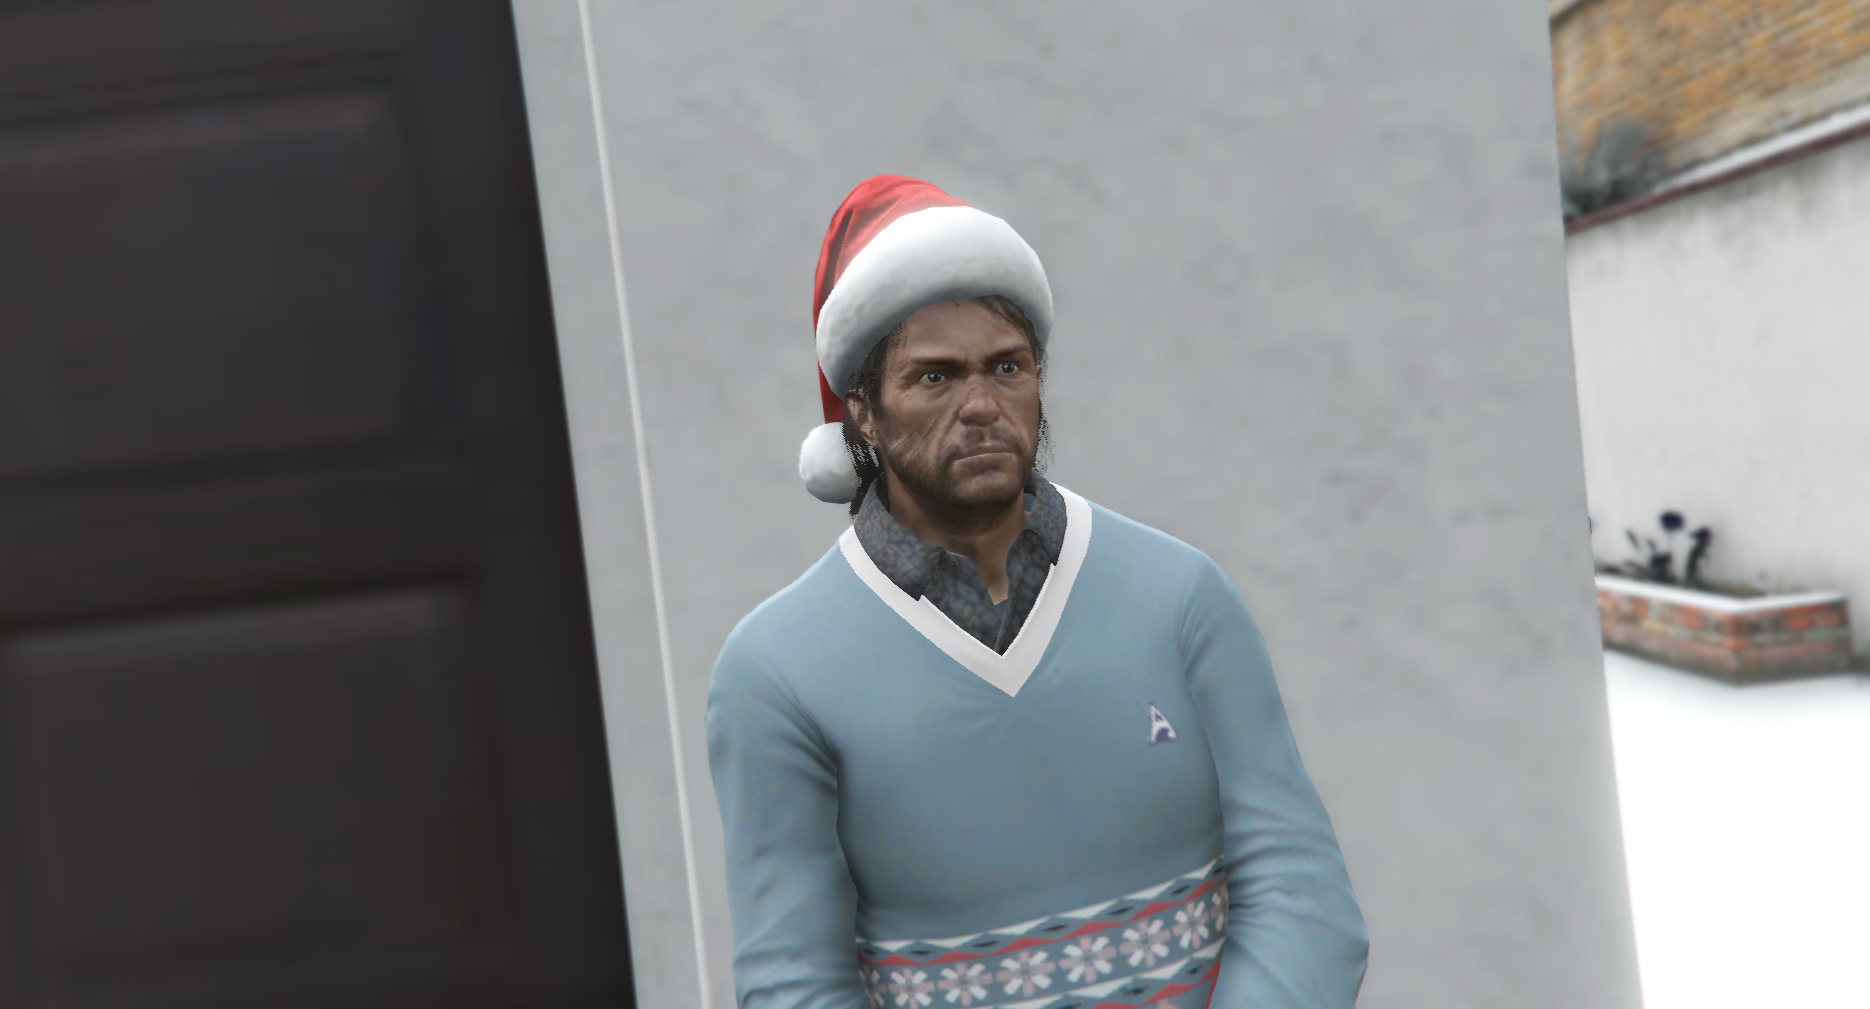 christmas clothes for john marston